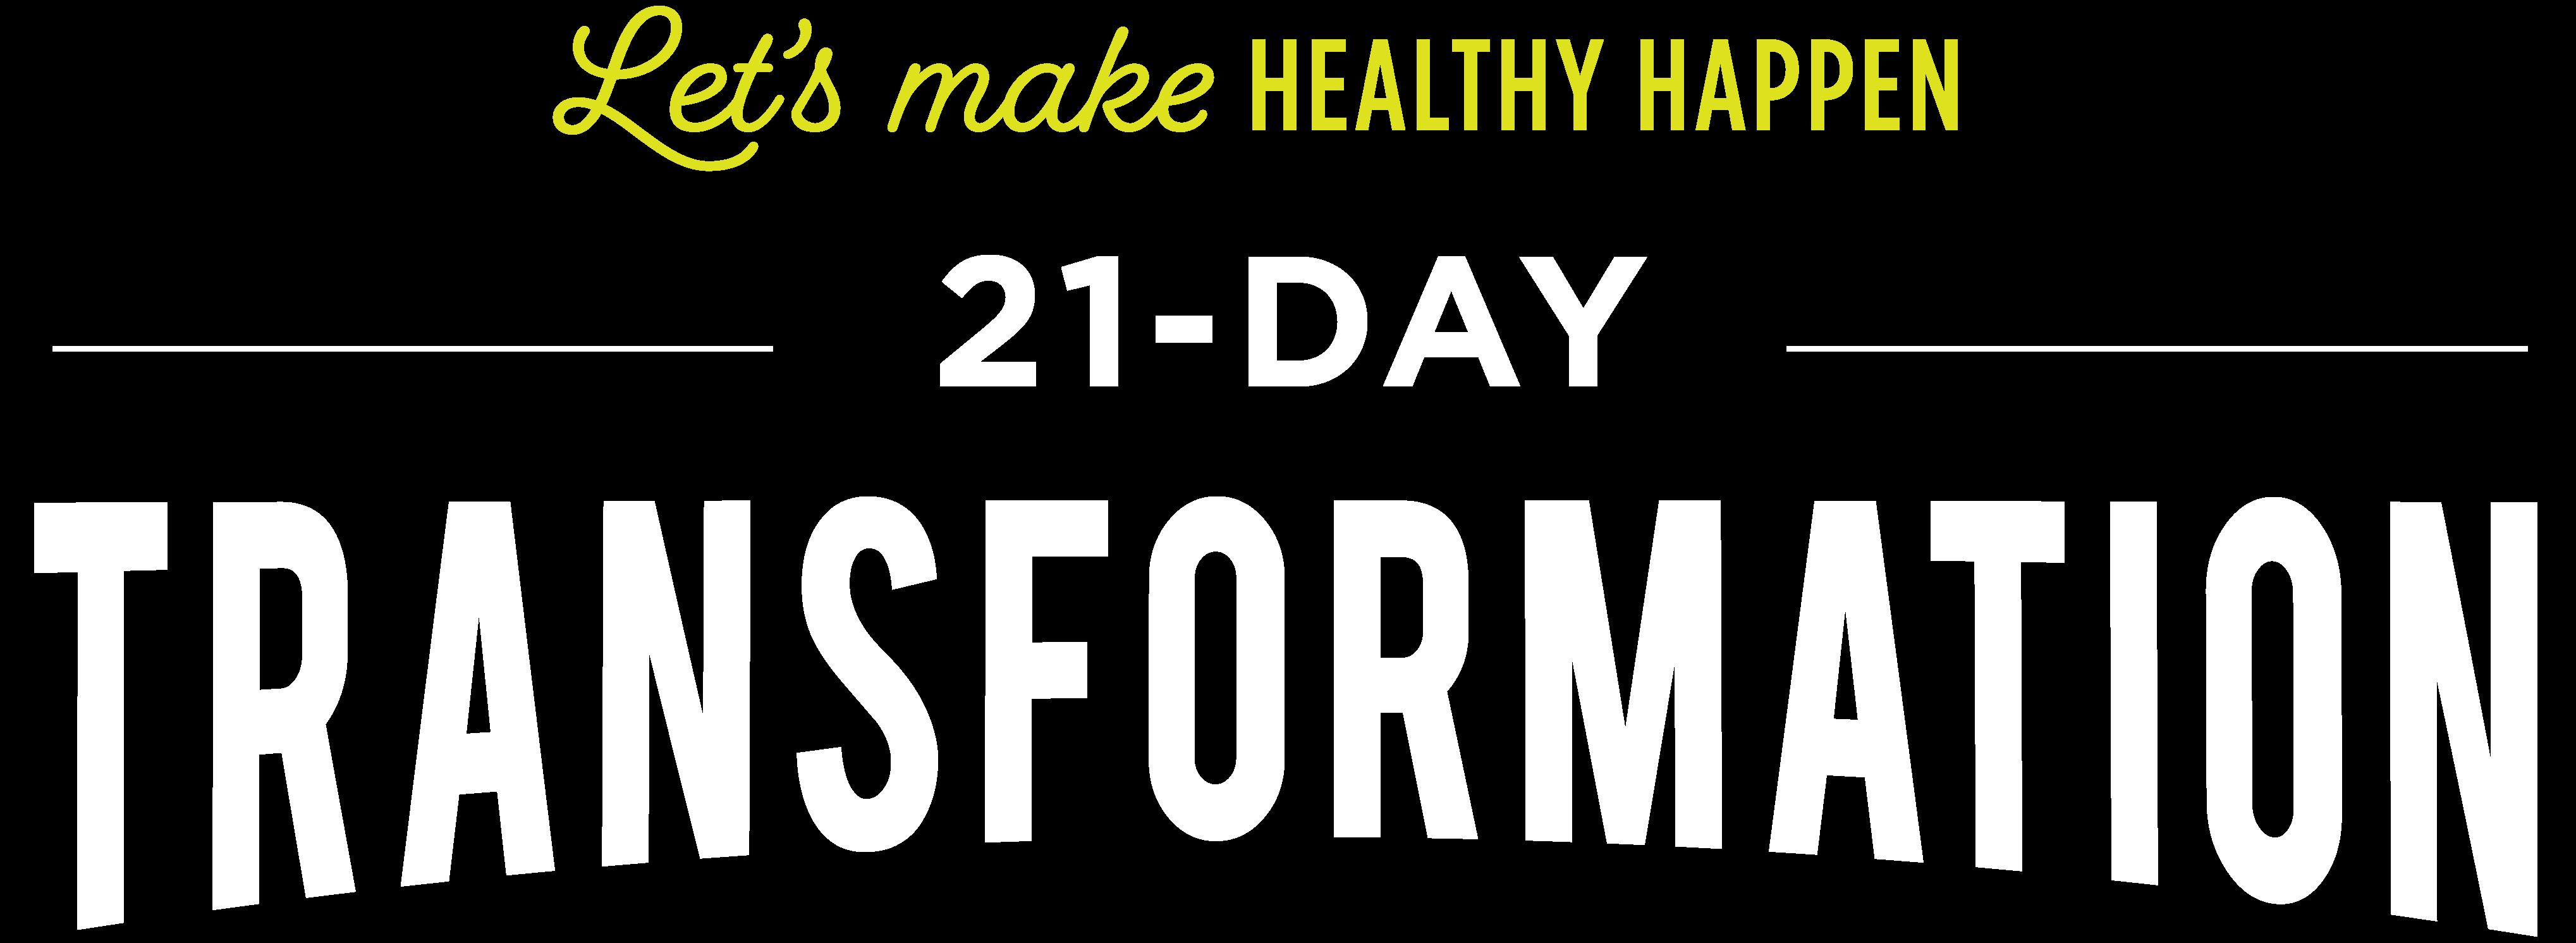 Let's Make Healthy Happen 21-Day Transformation